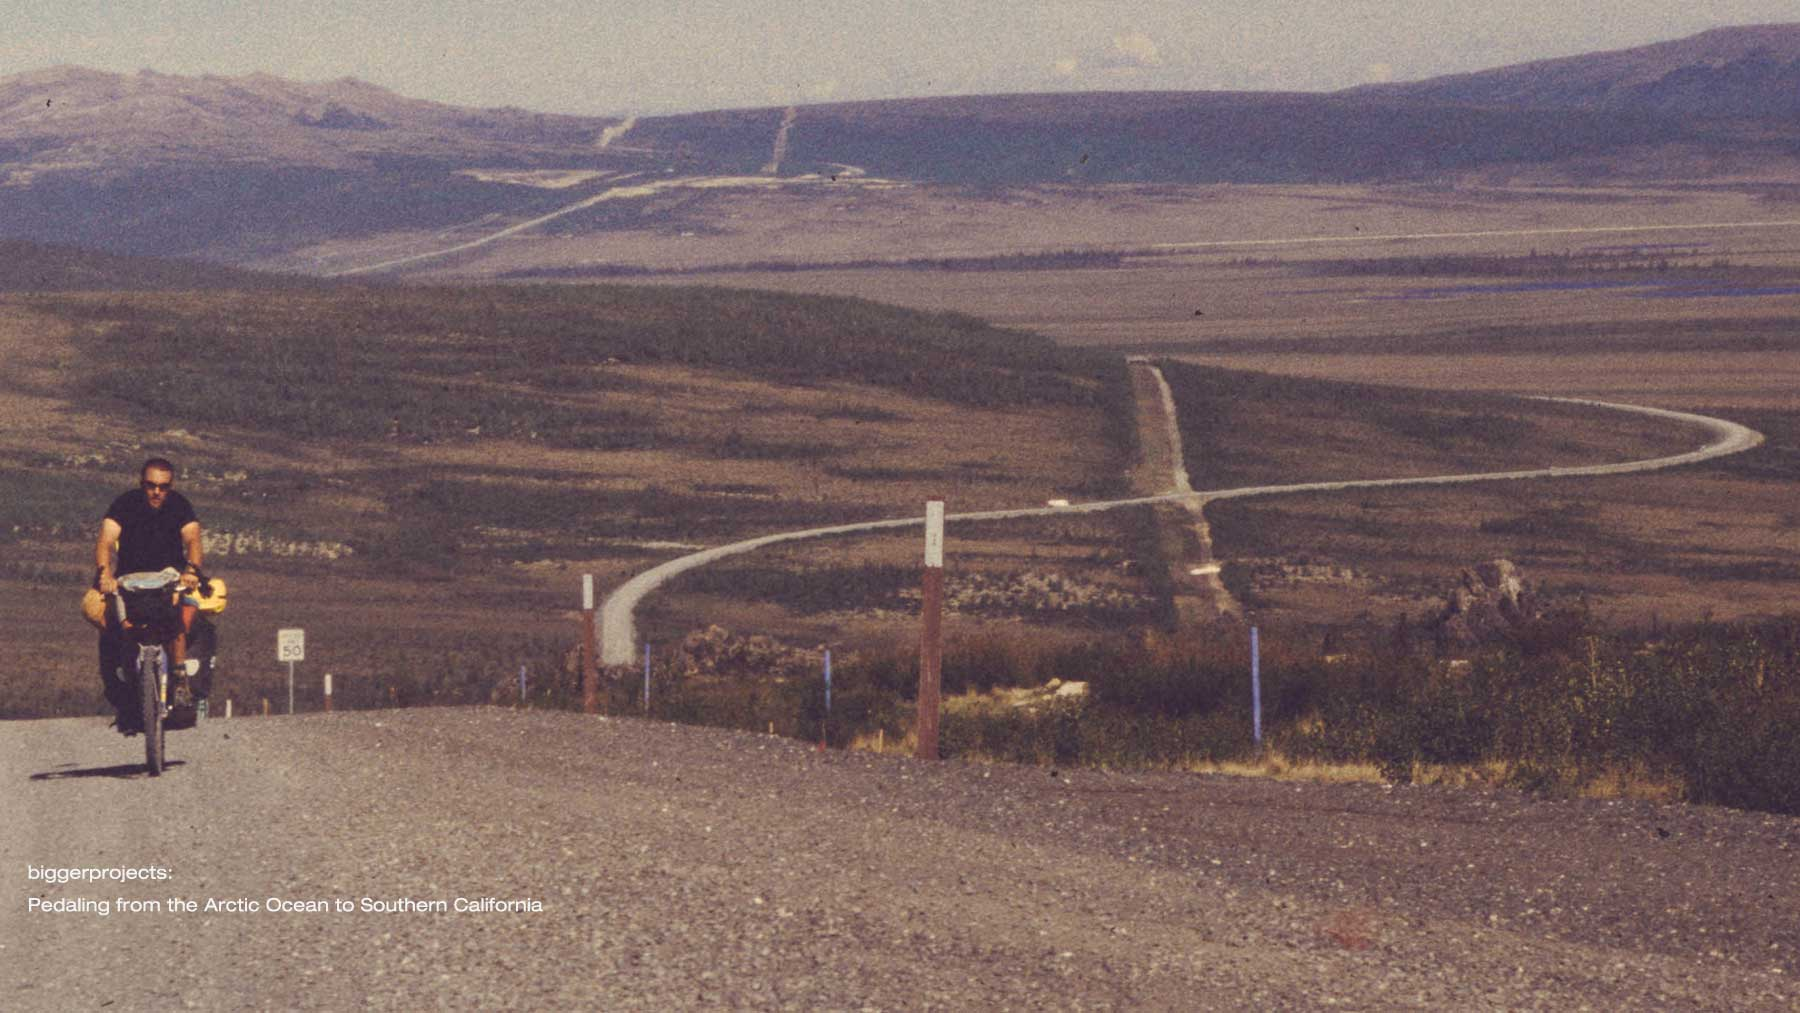 Pedaling from the Arctic Ocean through Alaska, Yukon, BC, Washington, Oregon, and California